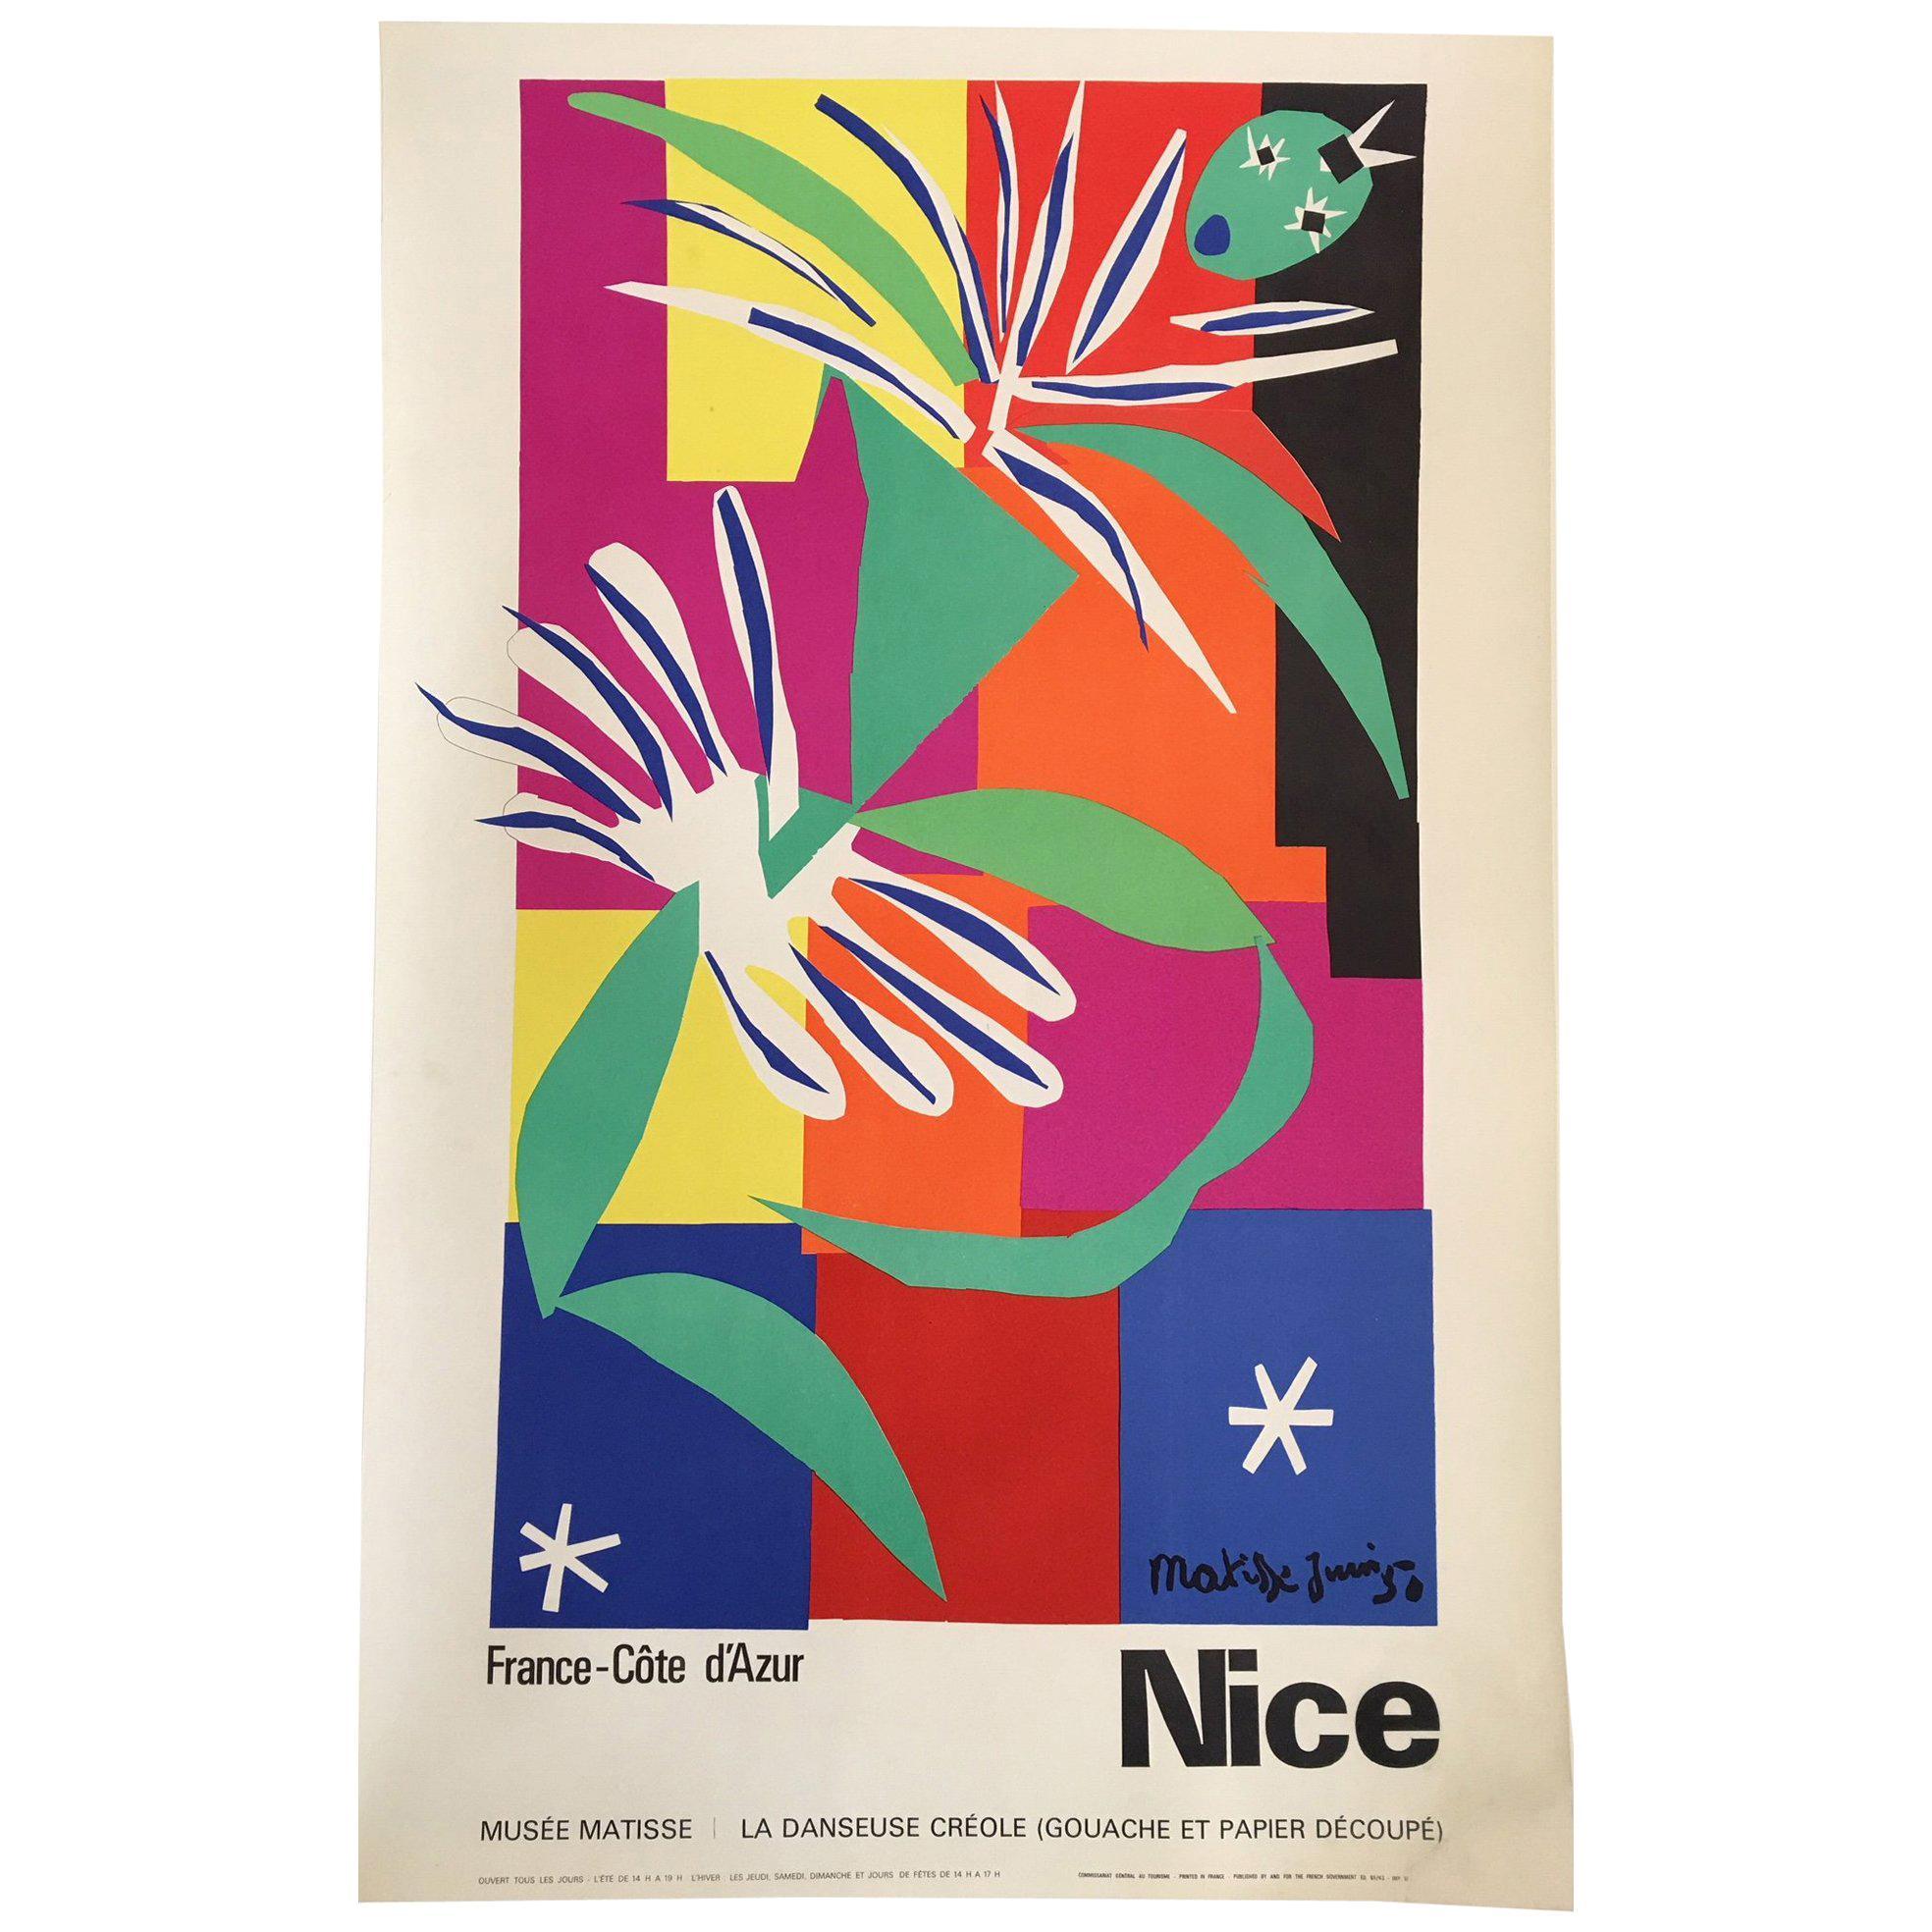 Vintage French Art & Exhibition Poster after Henri Matisse, 1960s, Nice